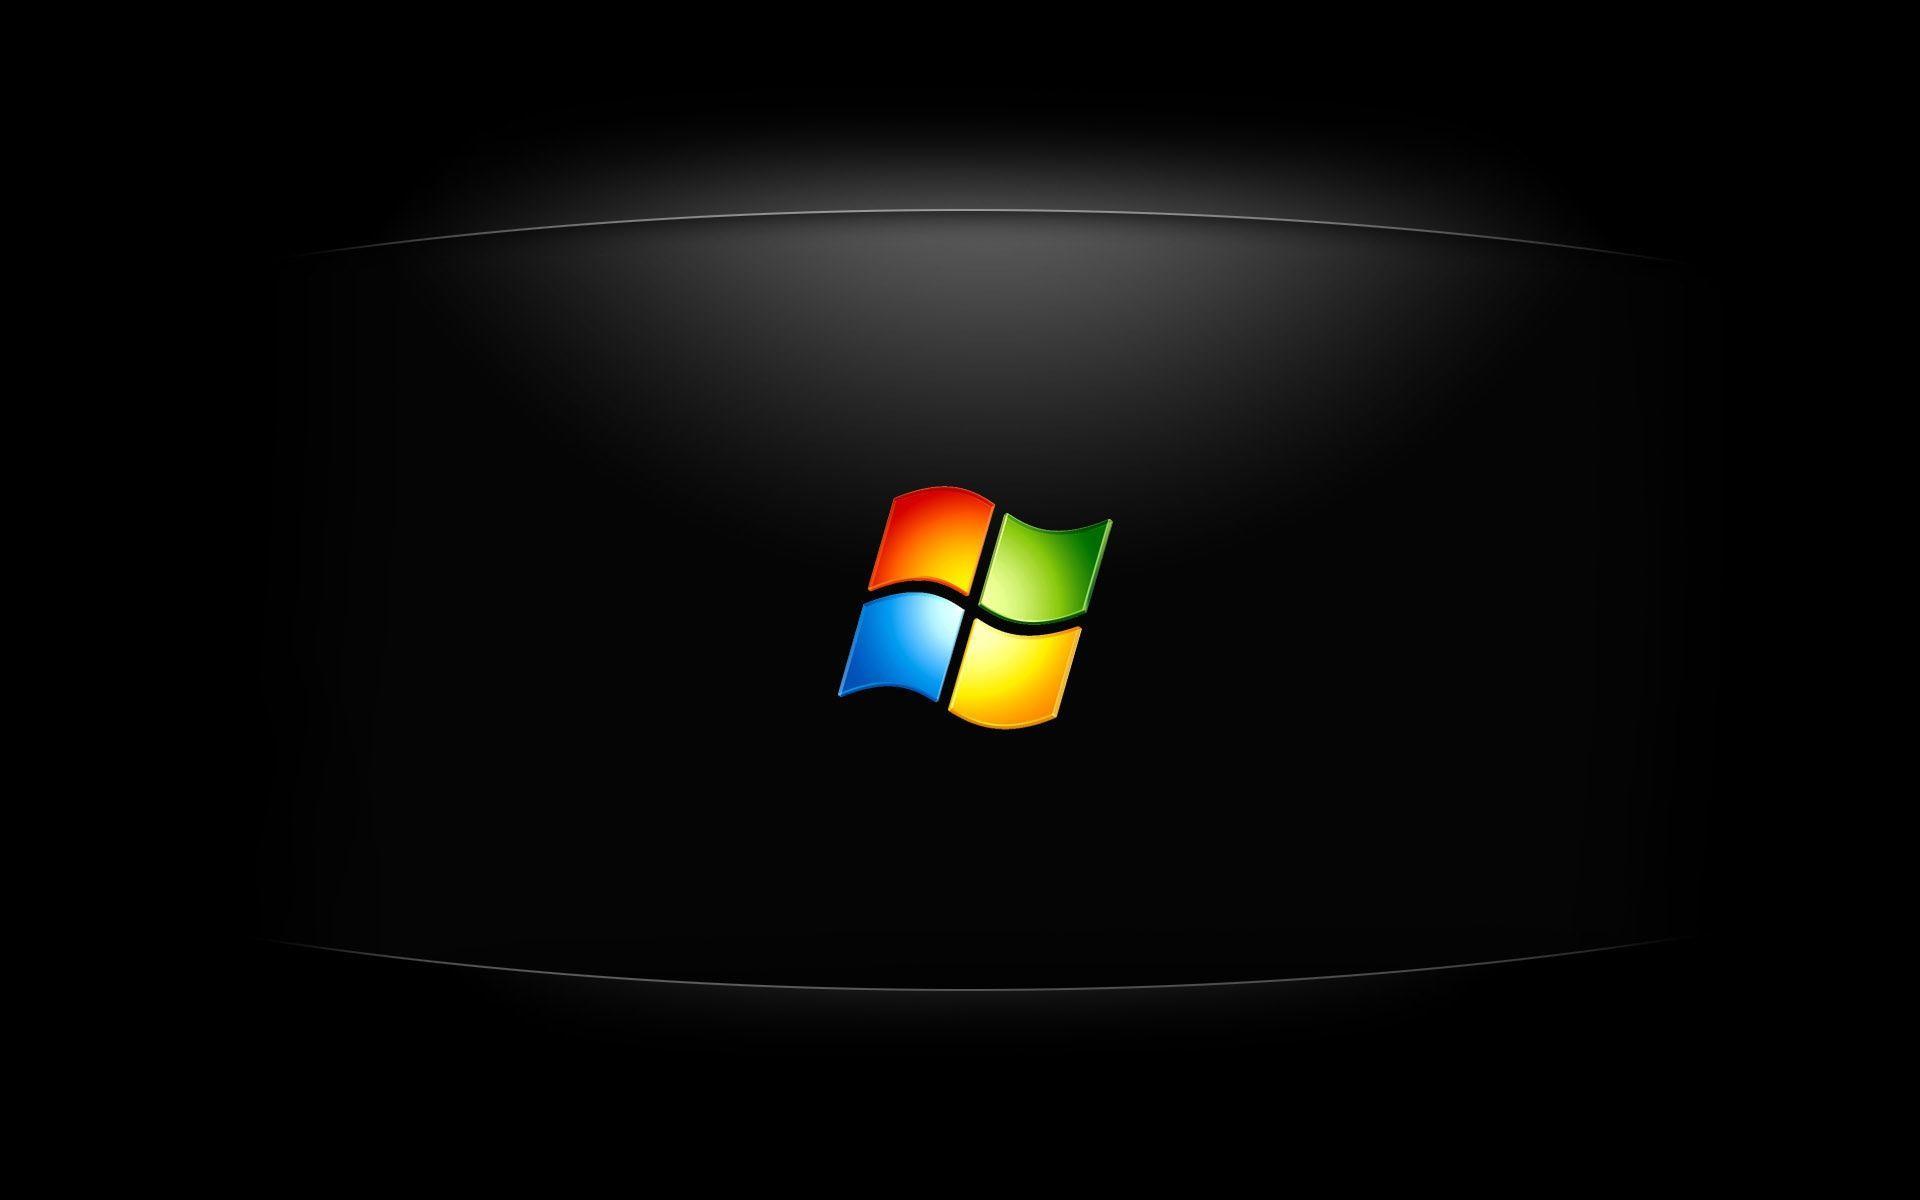 Windows Logo Desktop Wallpapers.